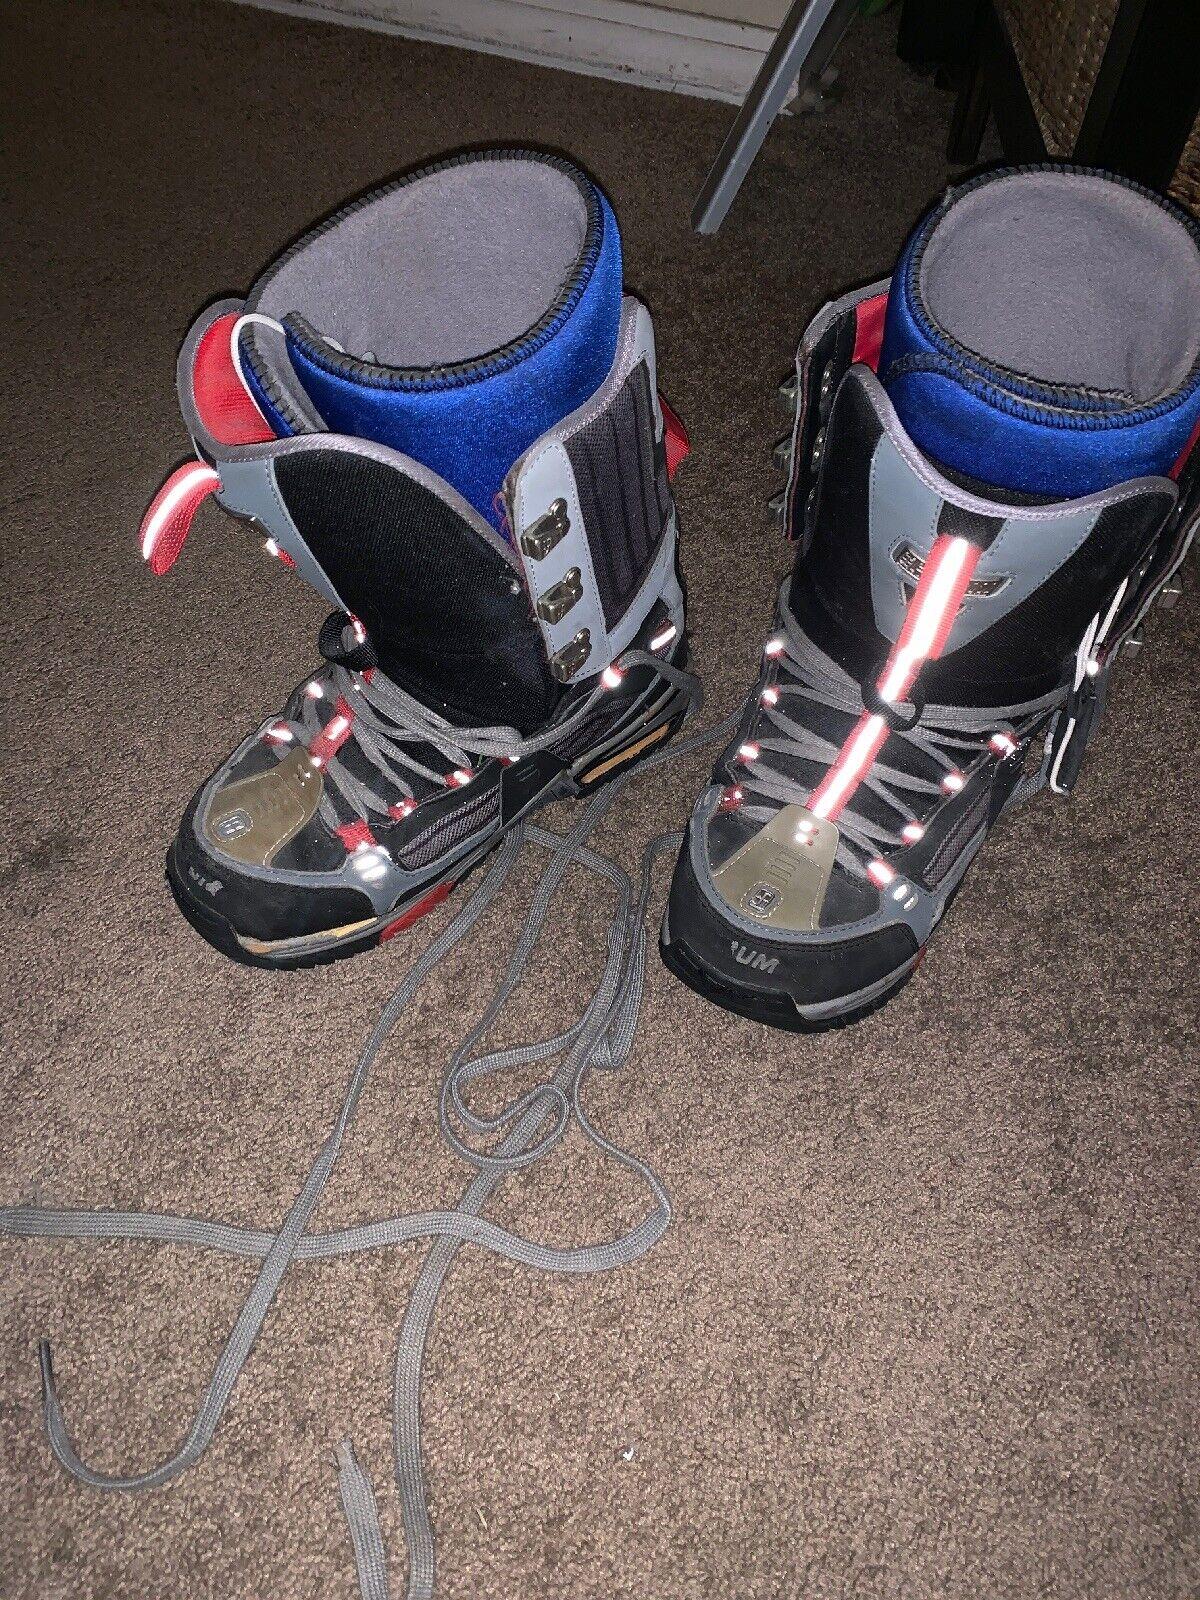 Size 10 -  Snowboarding Boots - Peter Line  enjoy saving 30-50% off